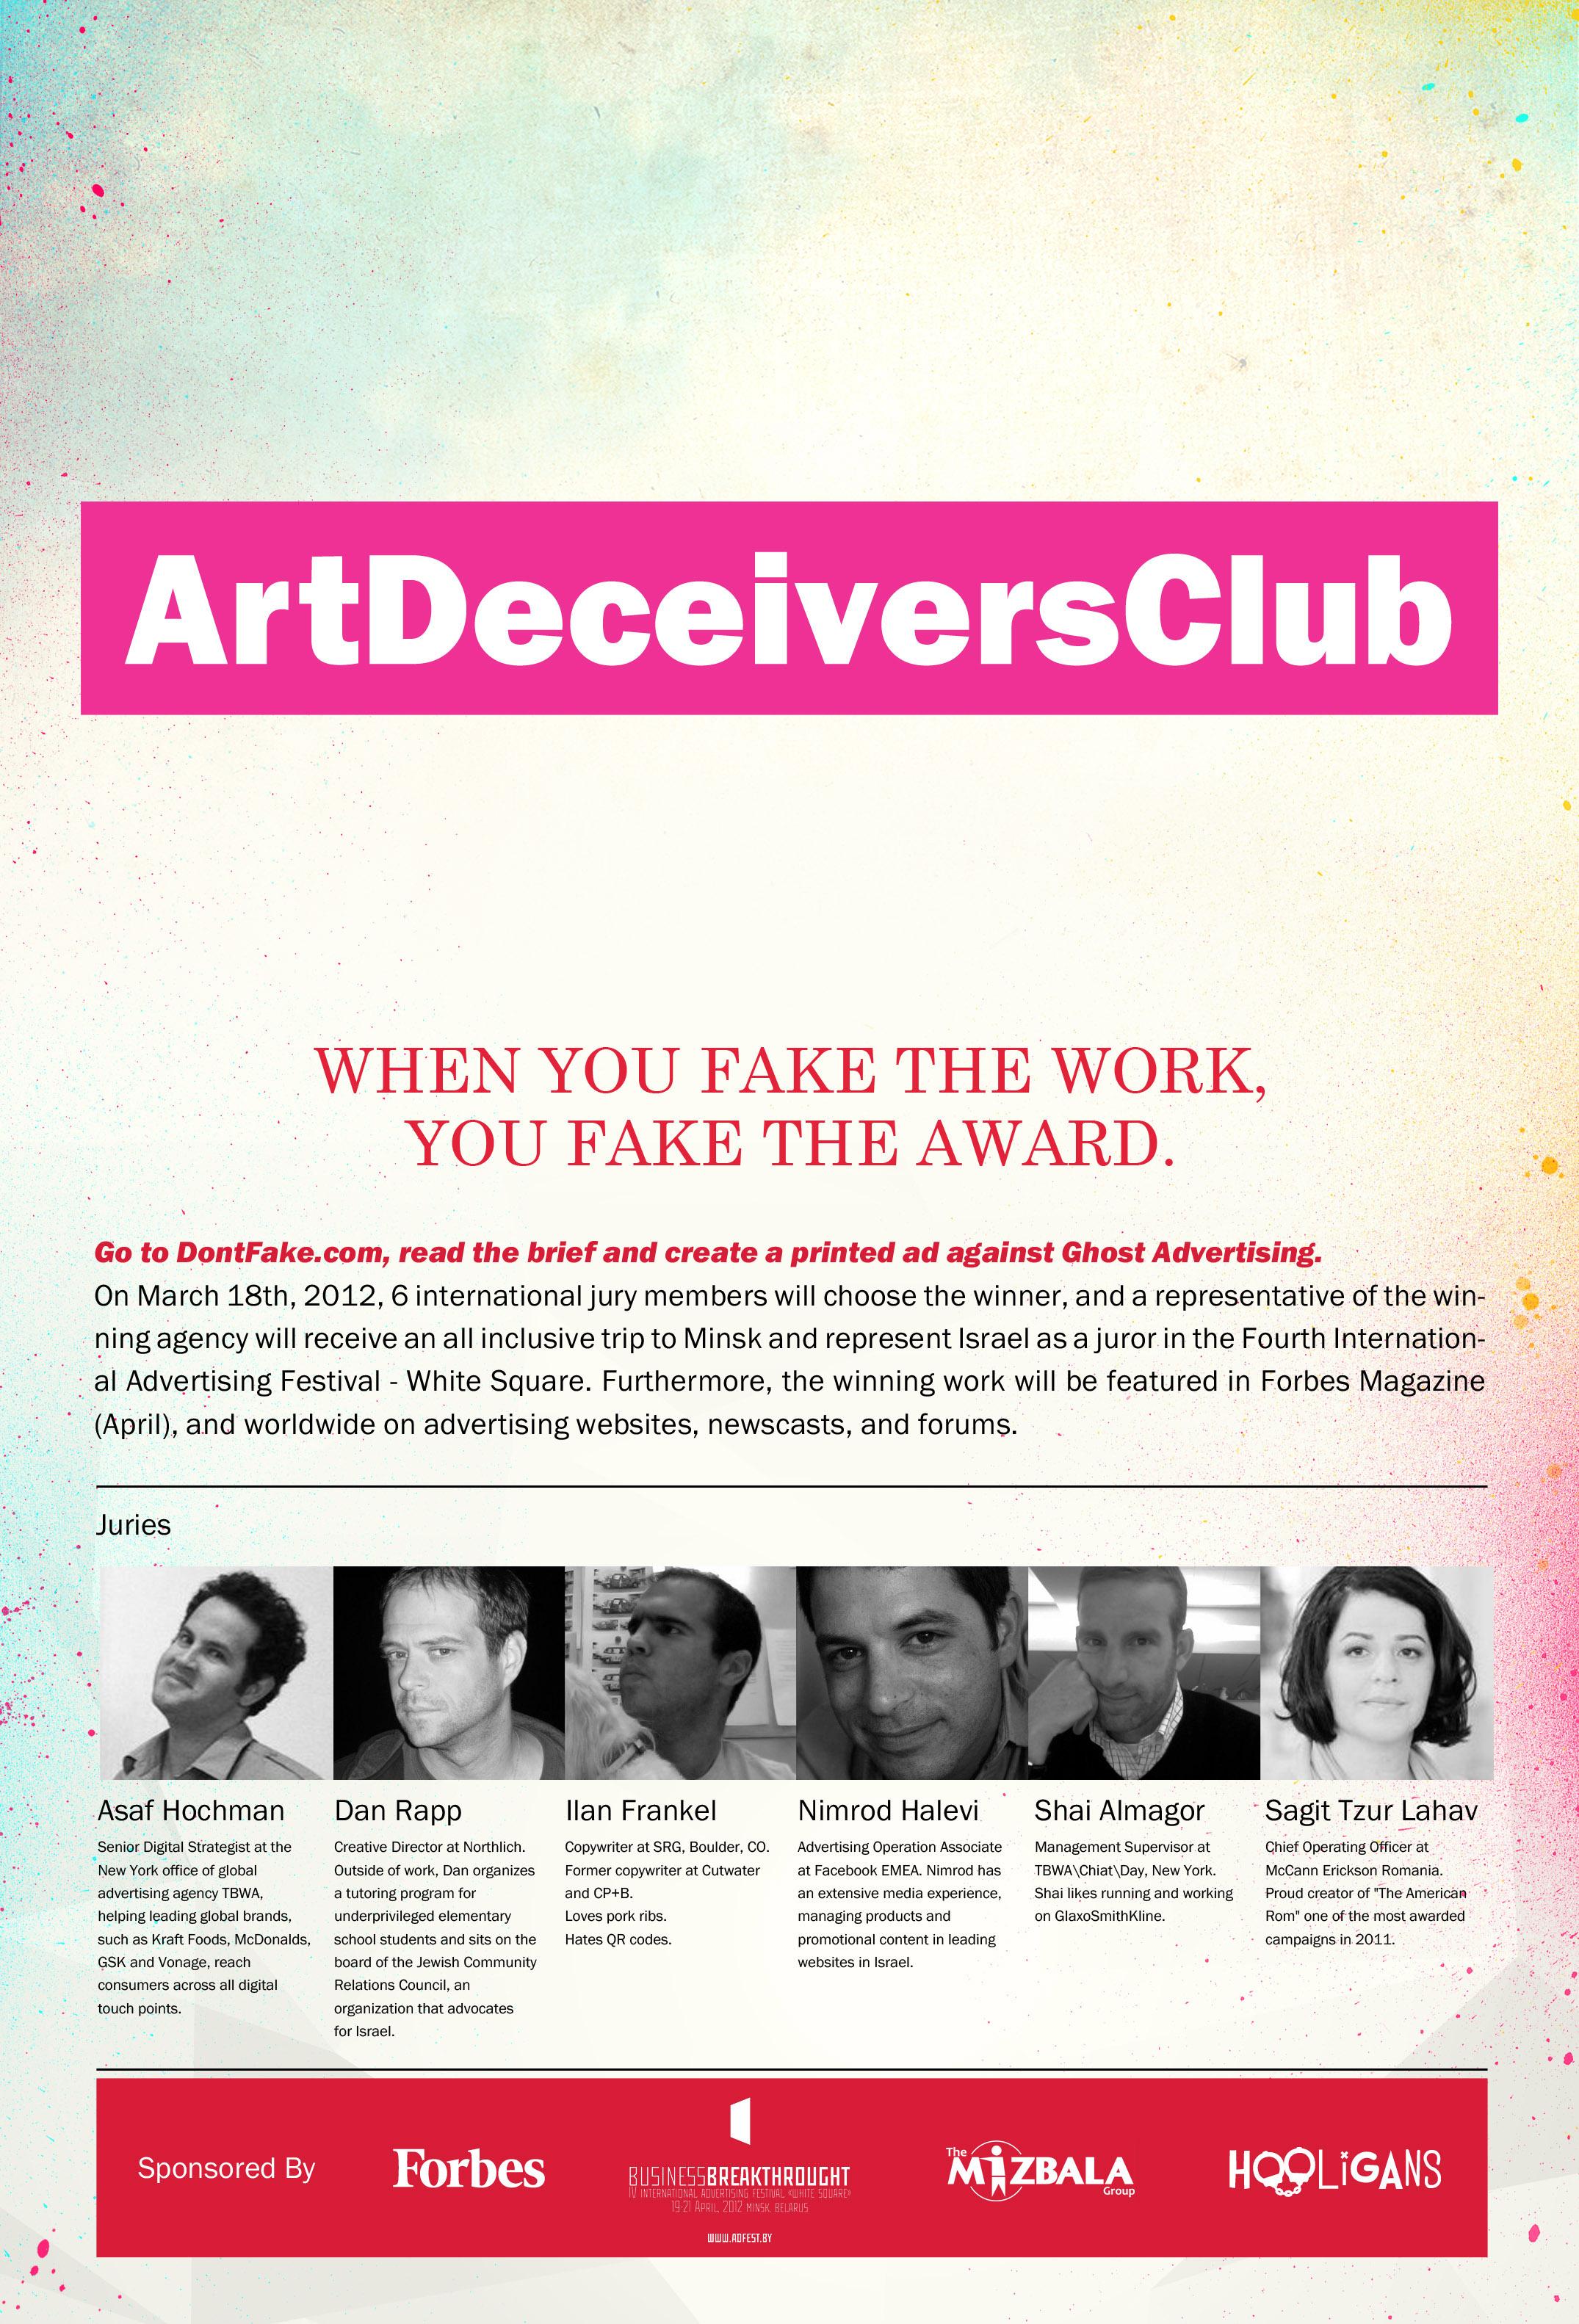 ArtDeceiversClub